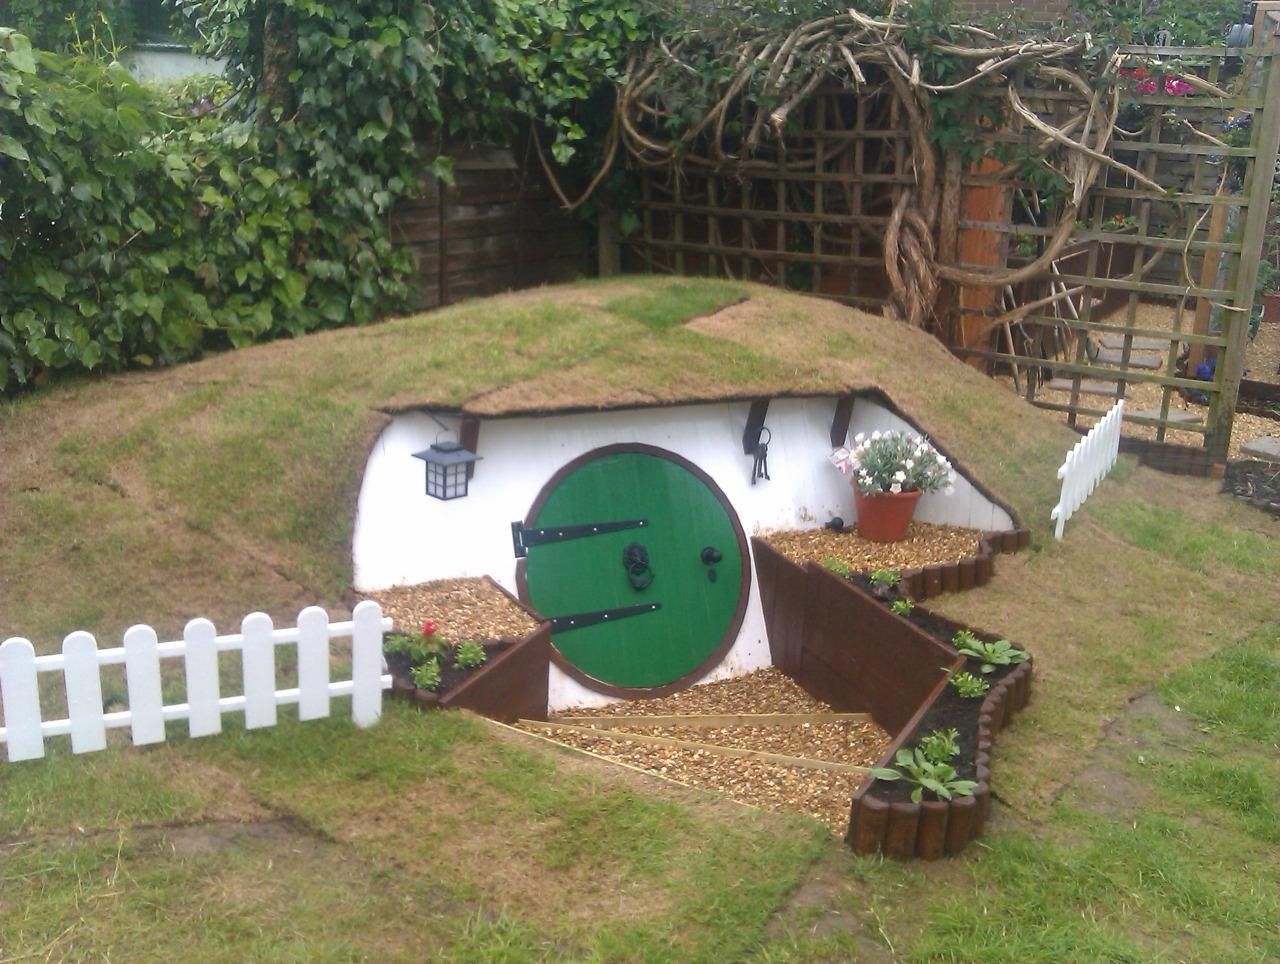 09-Ashley-Yeates-Architecture-with-the-Garden-Hobbit-Hole-www-designstack-co